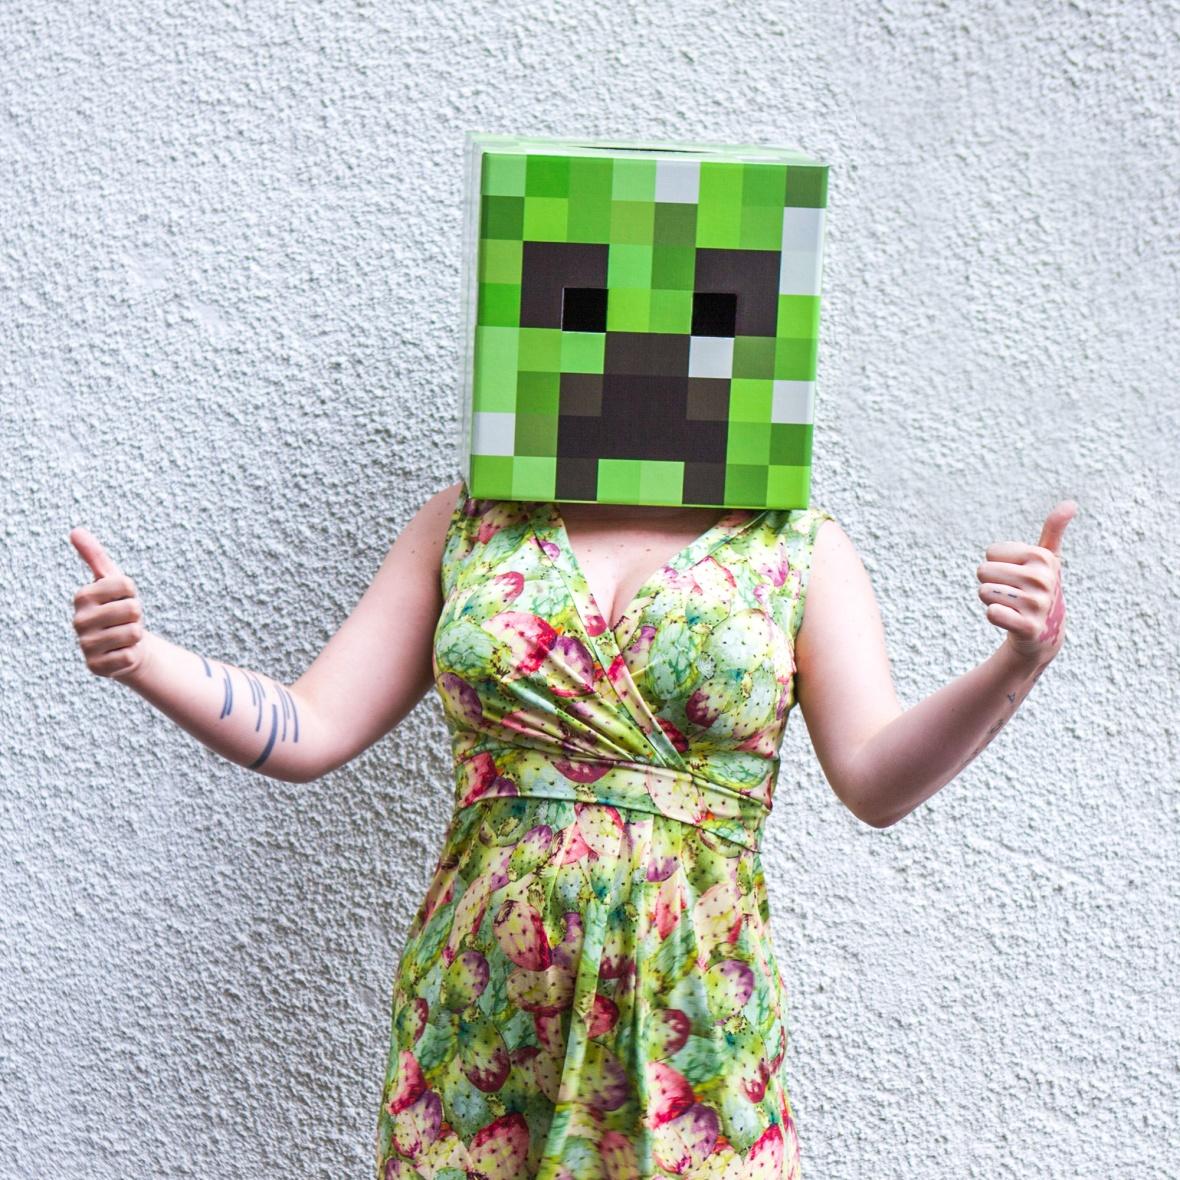 Thumbs Up Minecraft Creeper